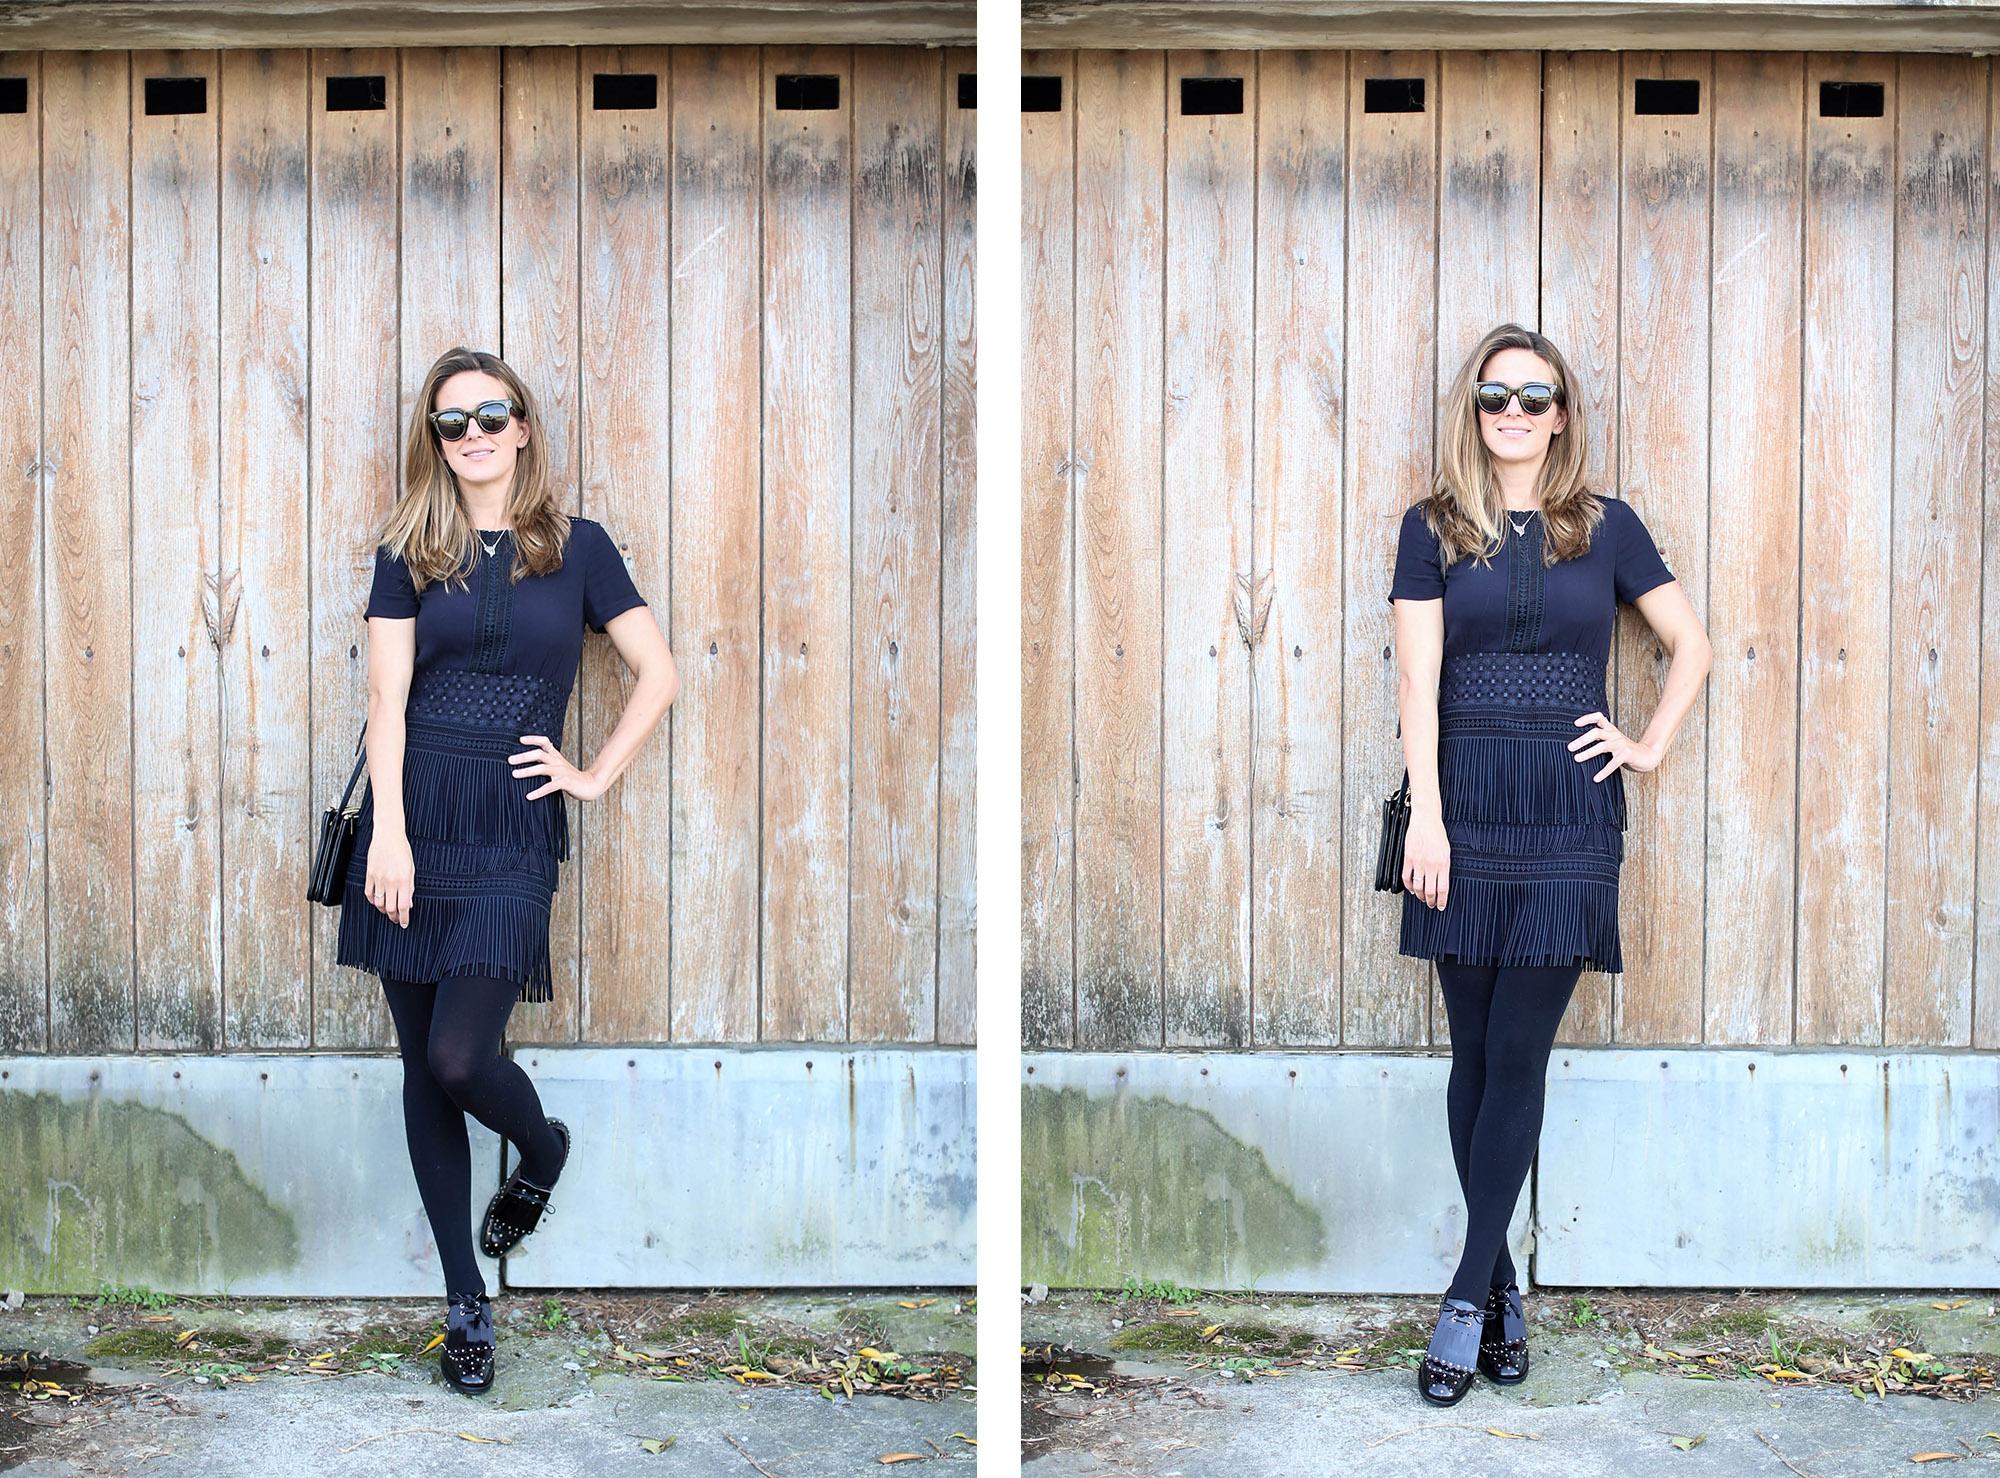 Clochet_streetstyle_fashionblogger_zapatosplanosbroguestachuelasPertini_vestidoMajeflecosReia-15